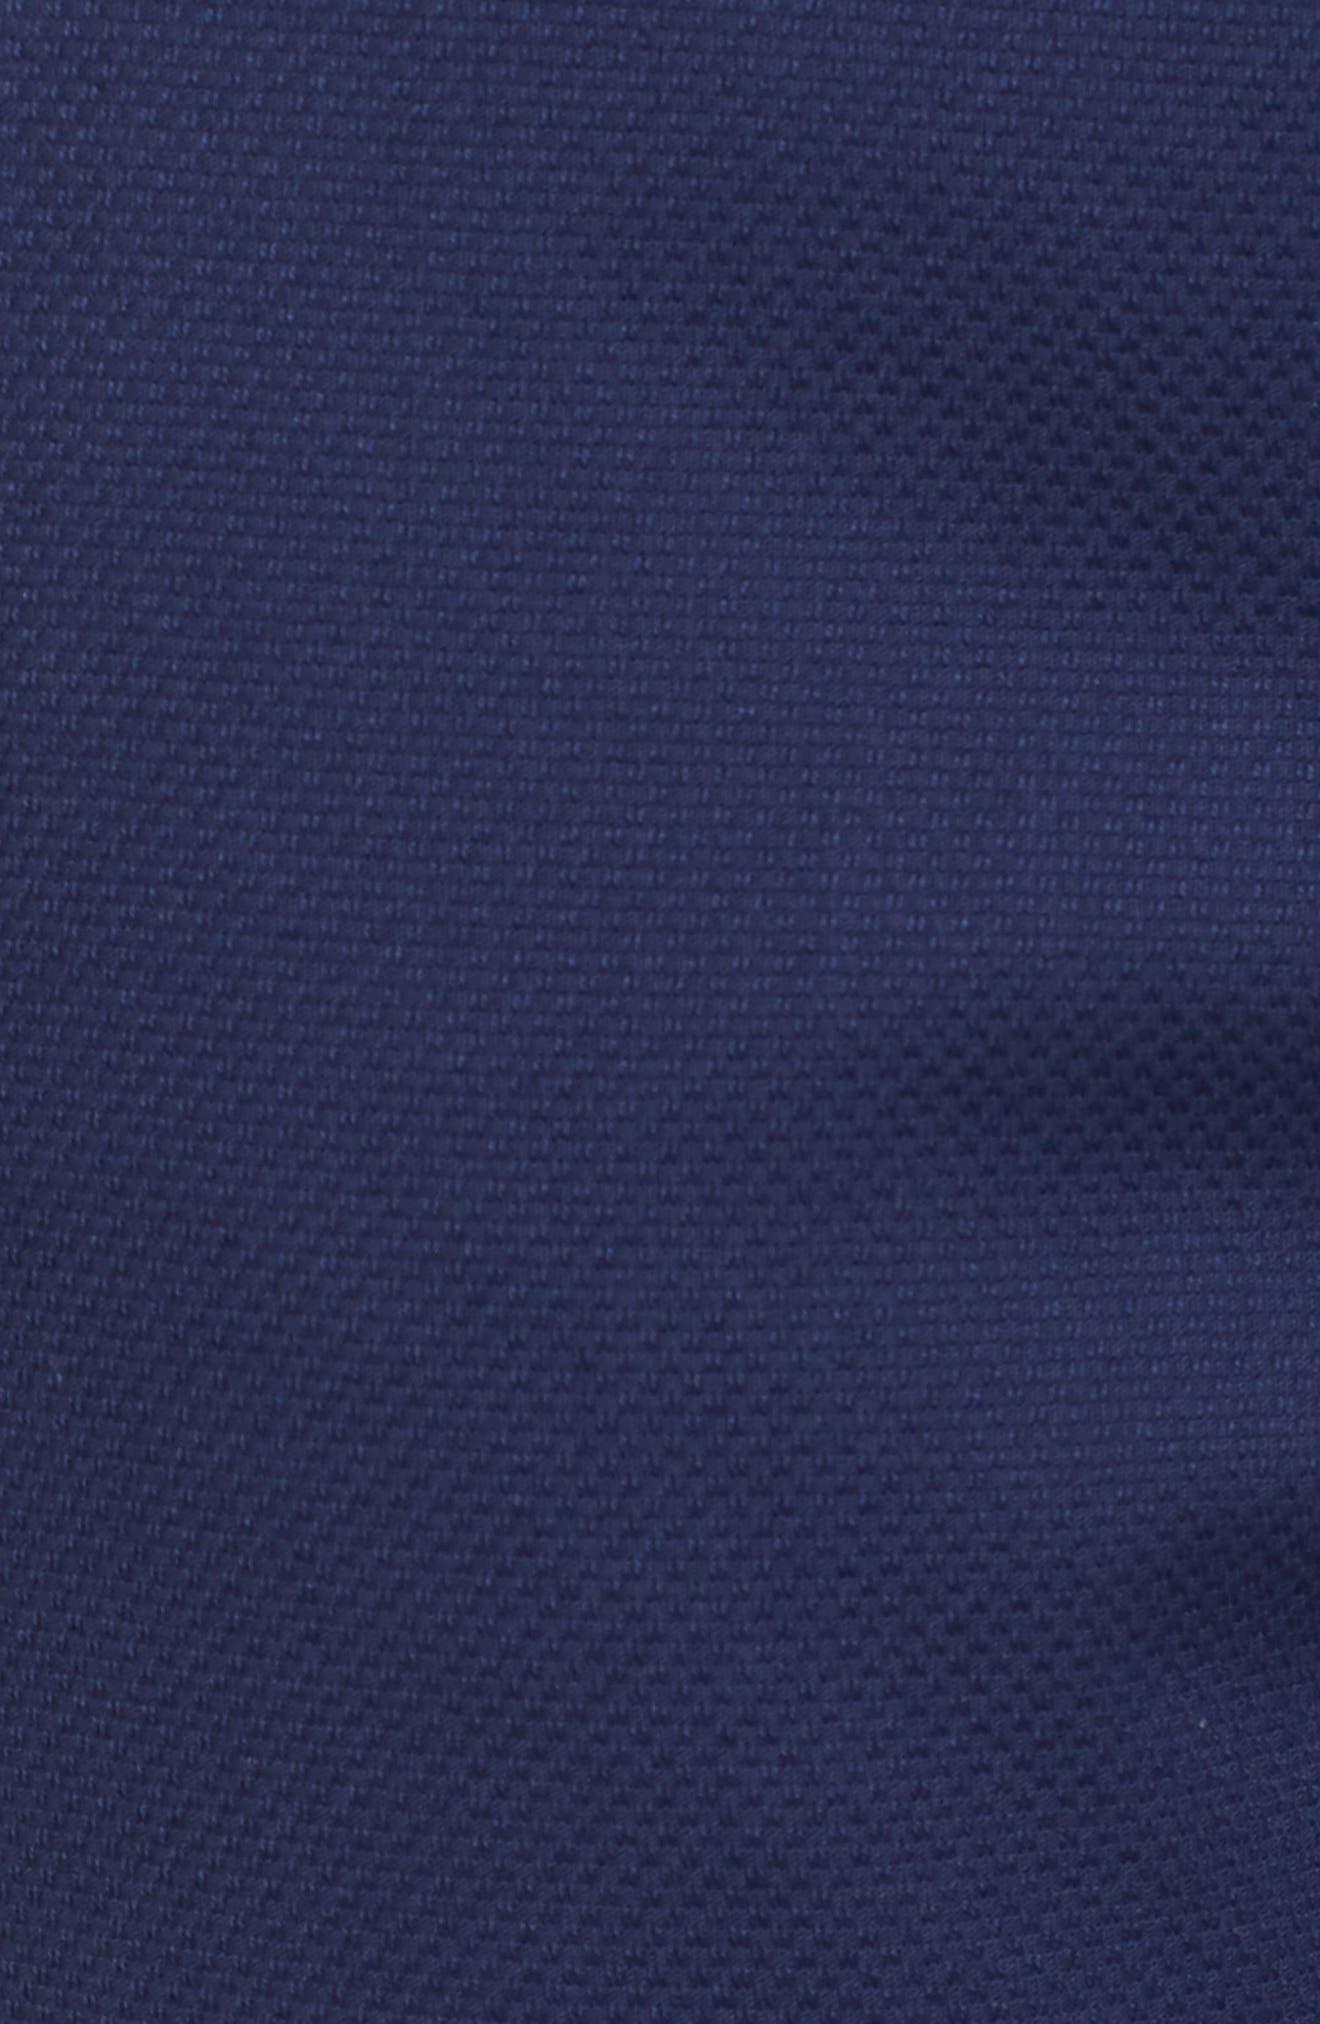 Maron Cuffed Straight Leg Pants,                             Alternate thumbnail 6, color,                             Navy